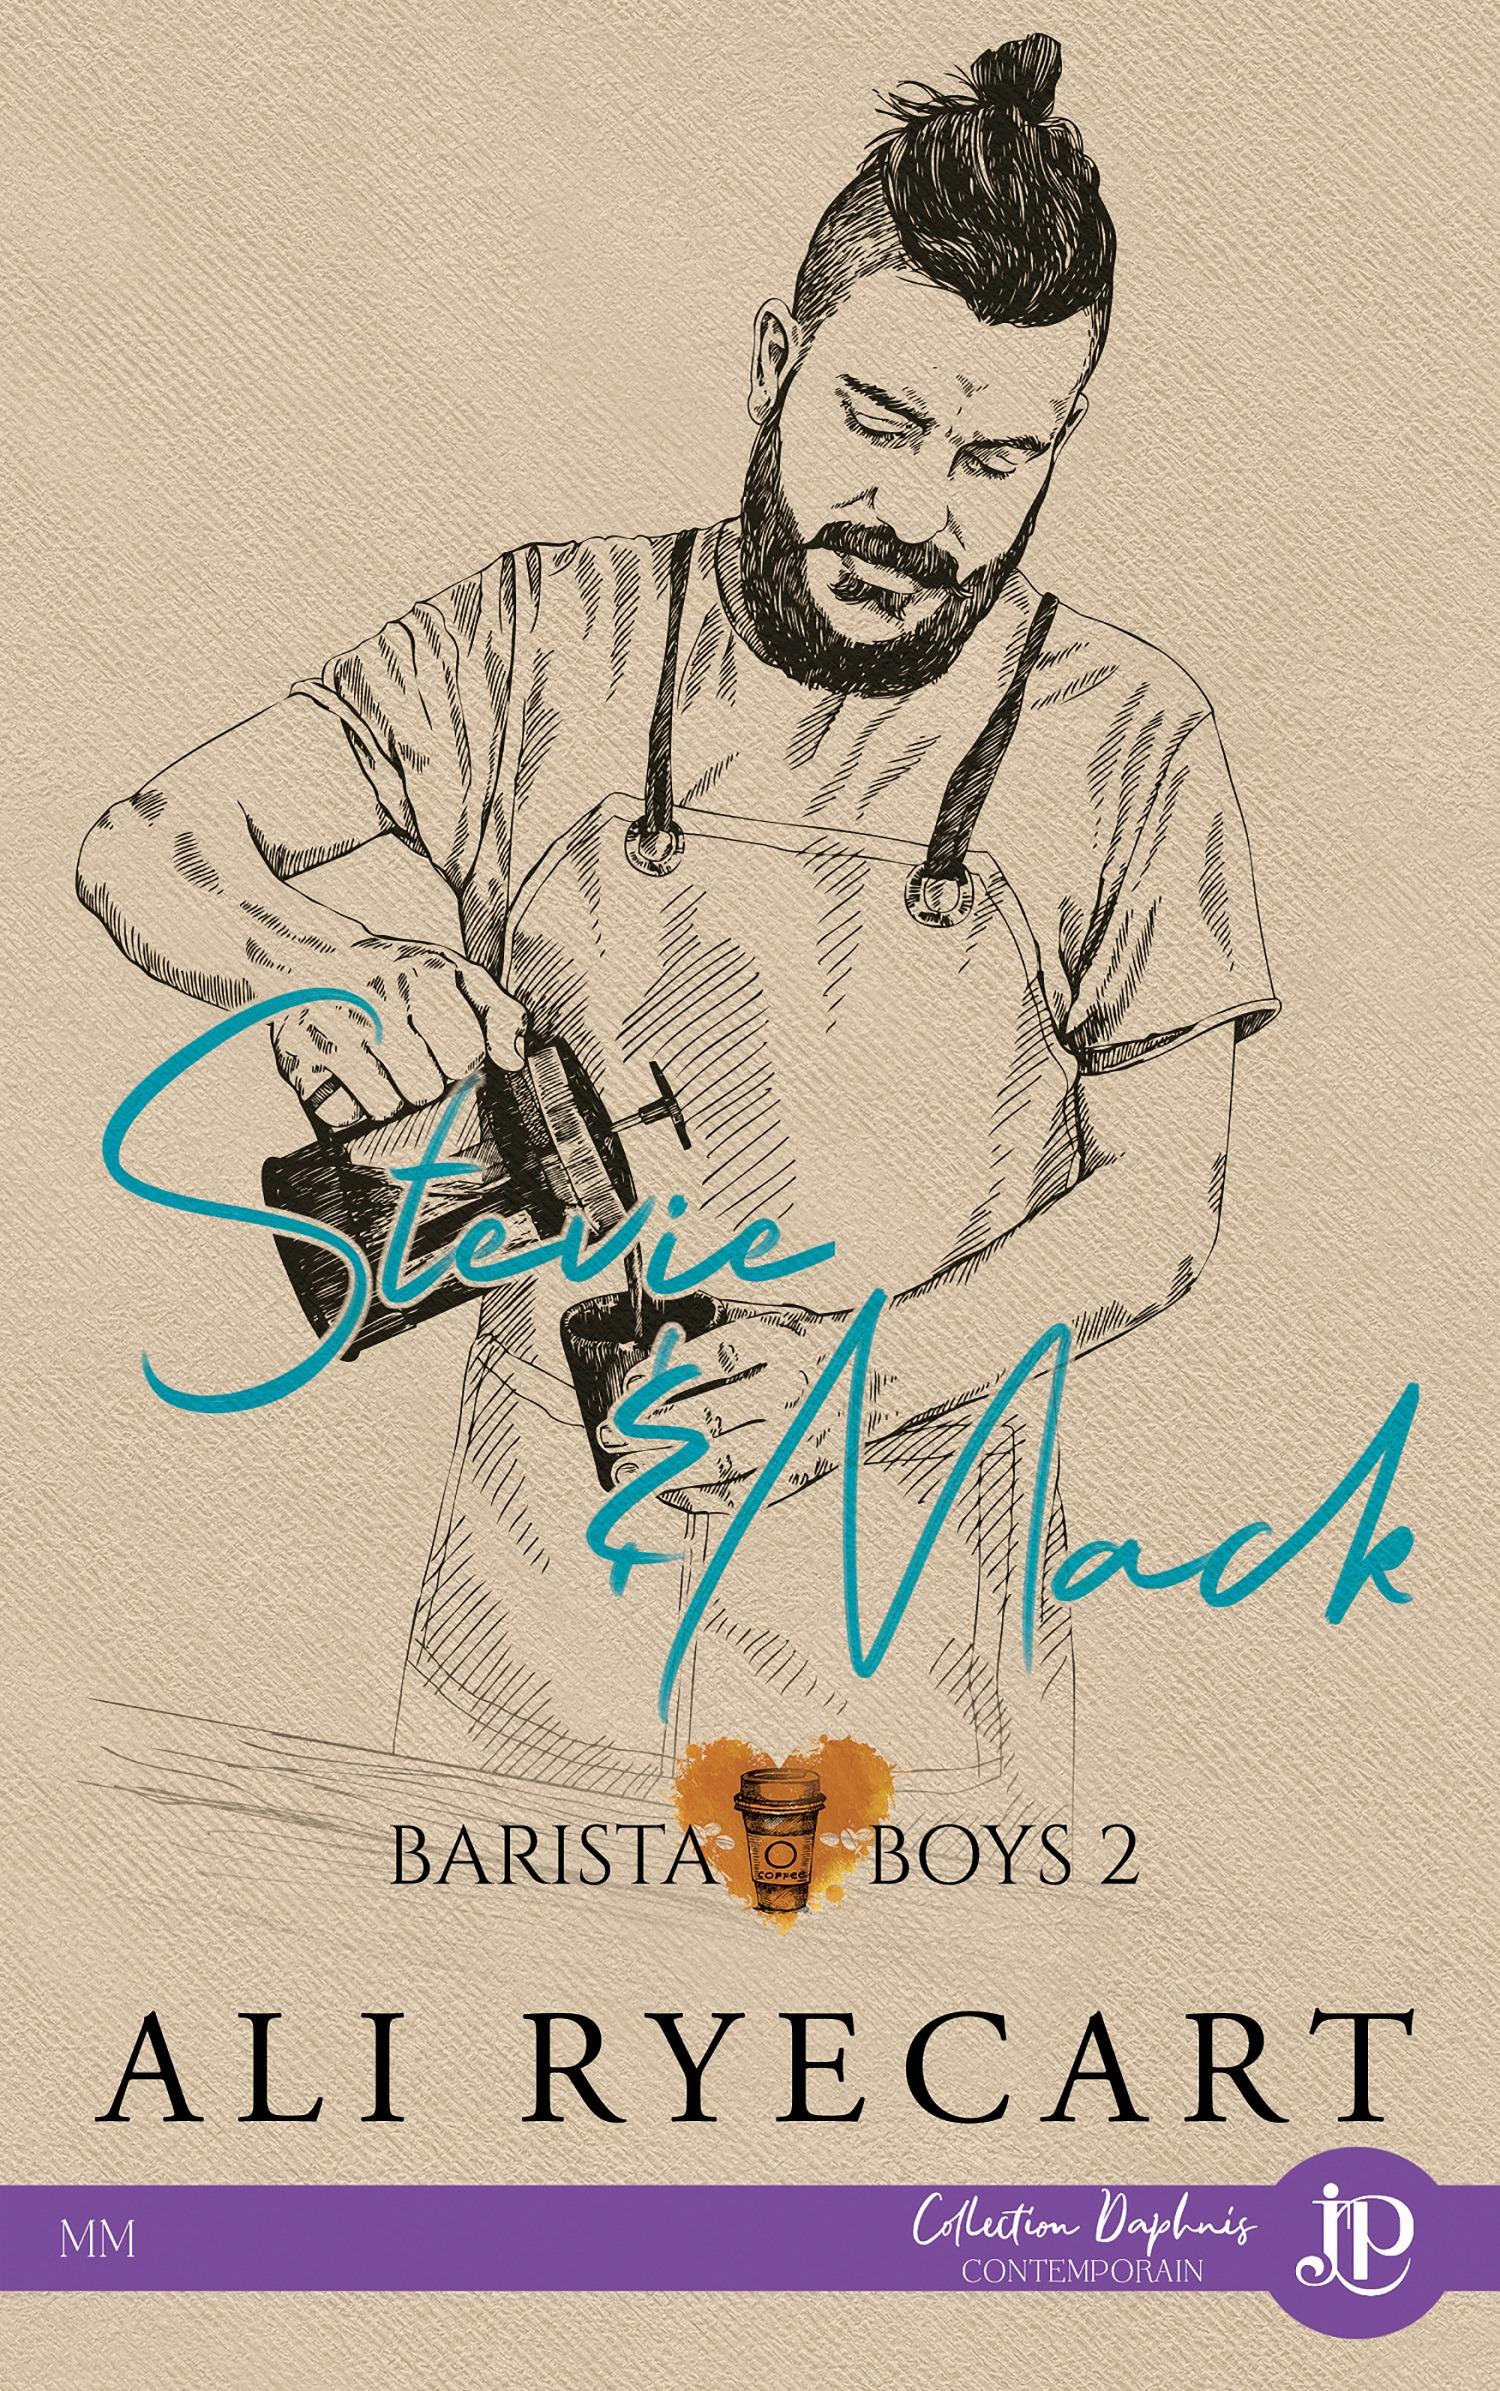 Barista boys - t02 - stevie & mack  - Ali Ryecart  - Ae Ryecart